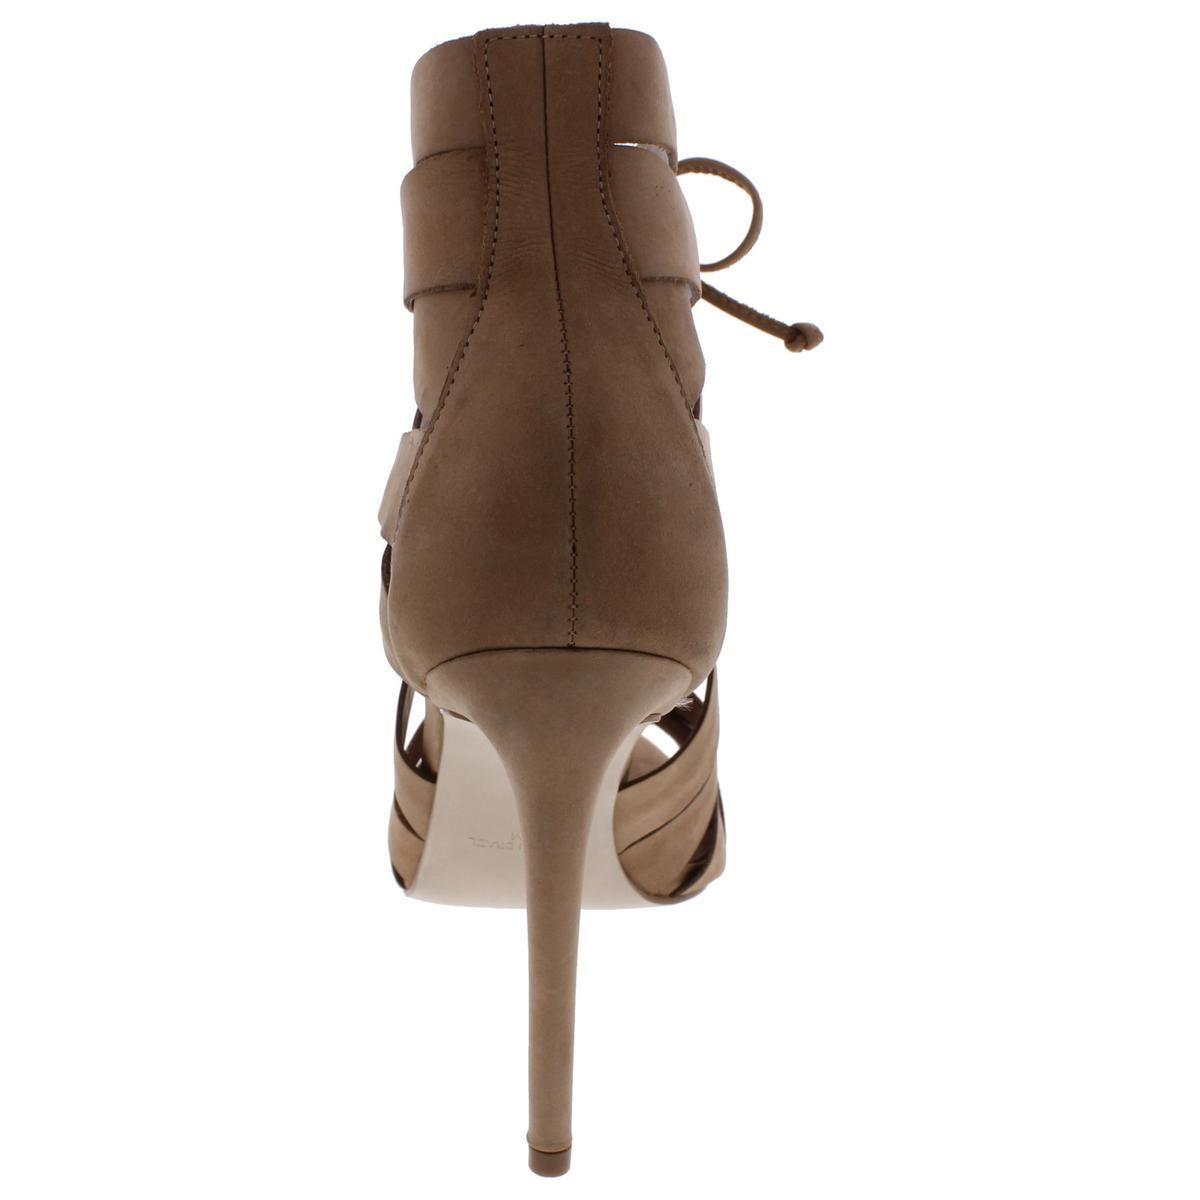 1b9af0f662a Lyst - Steve Madden Bae High Heel Dress Sandal in Brown - Save 43%